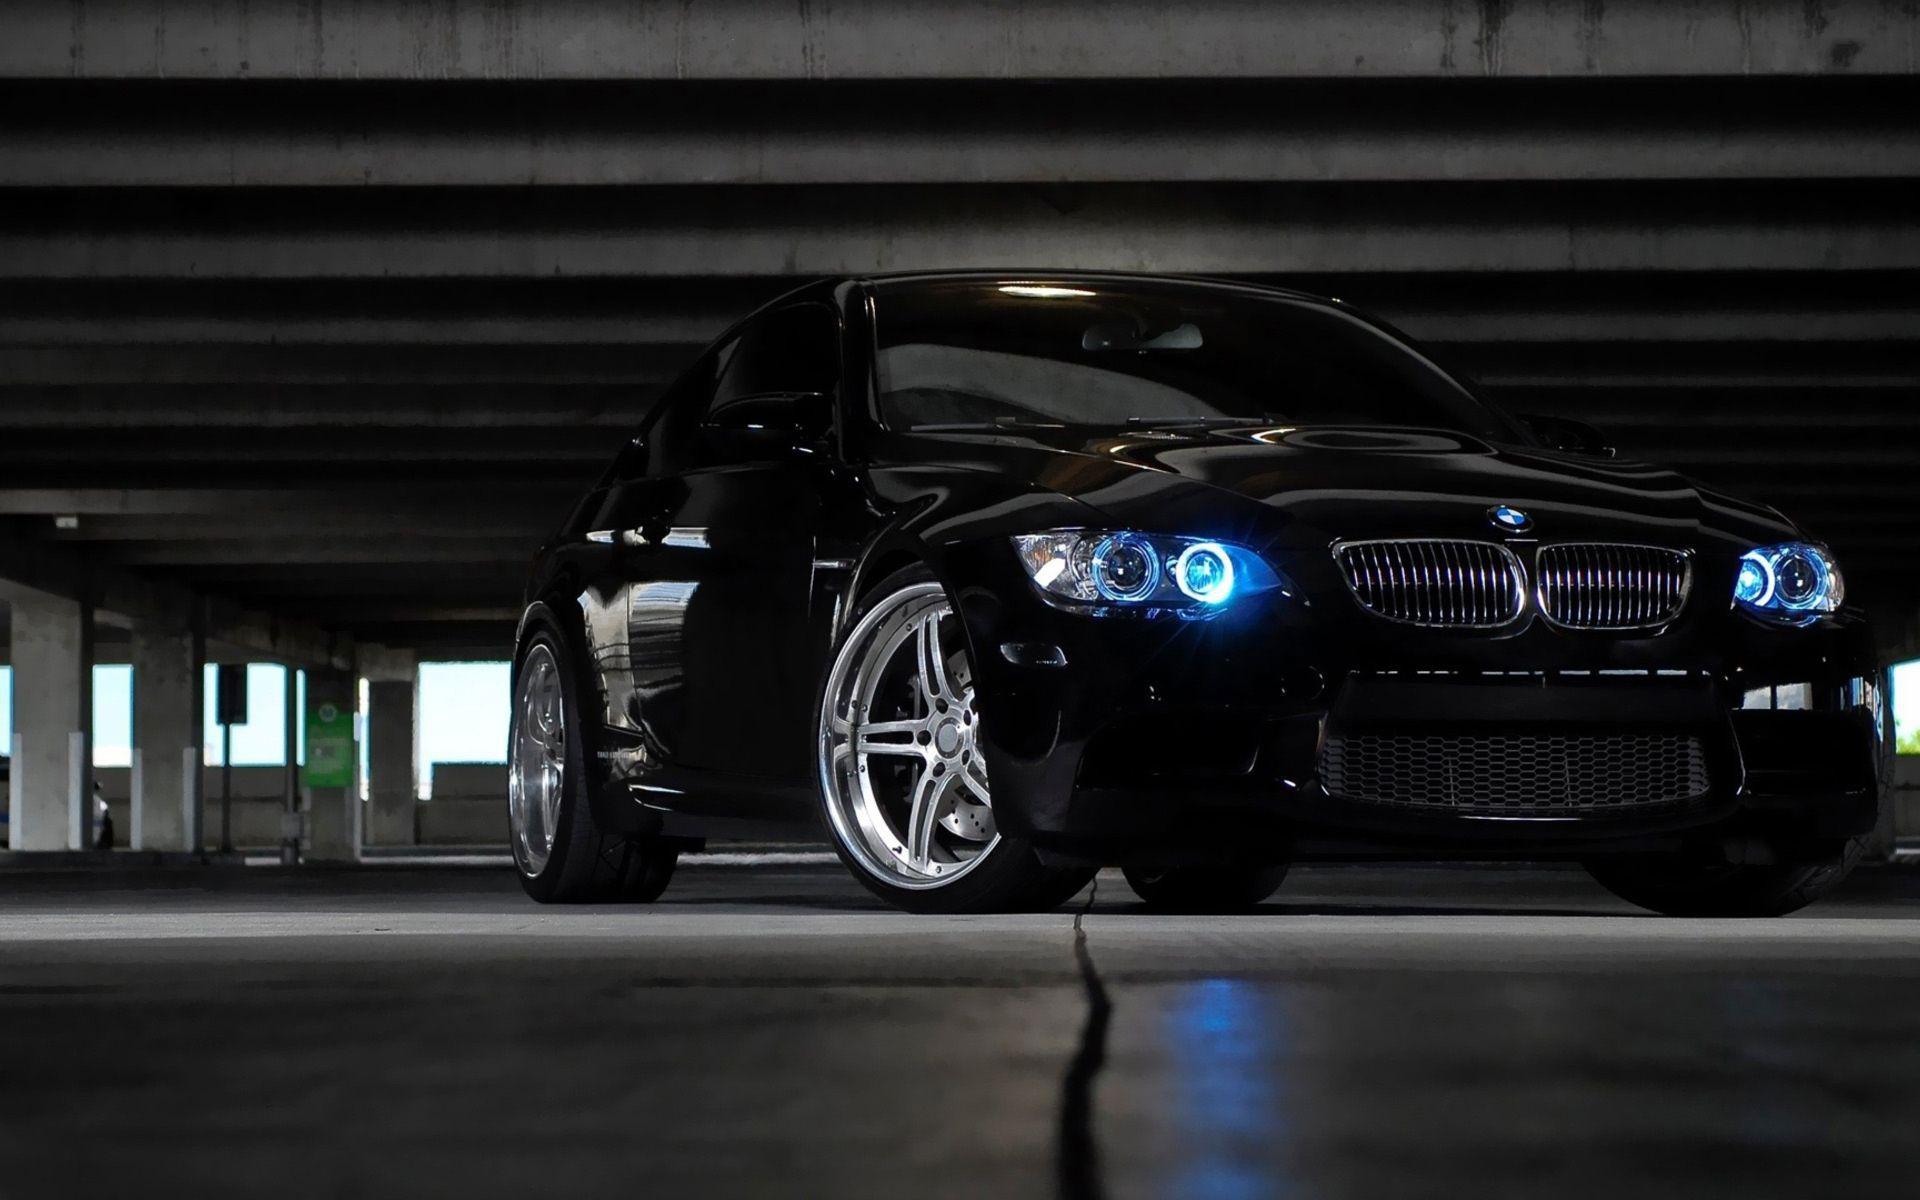 bmw m sport car rear angle | automotive | pinterest | bmw, car